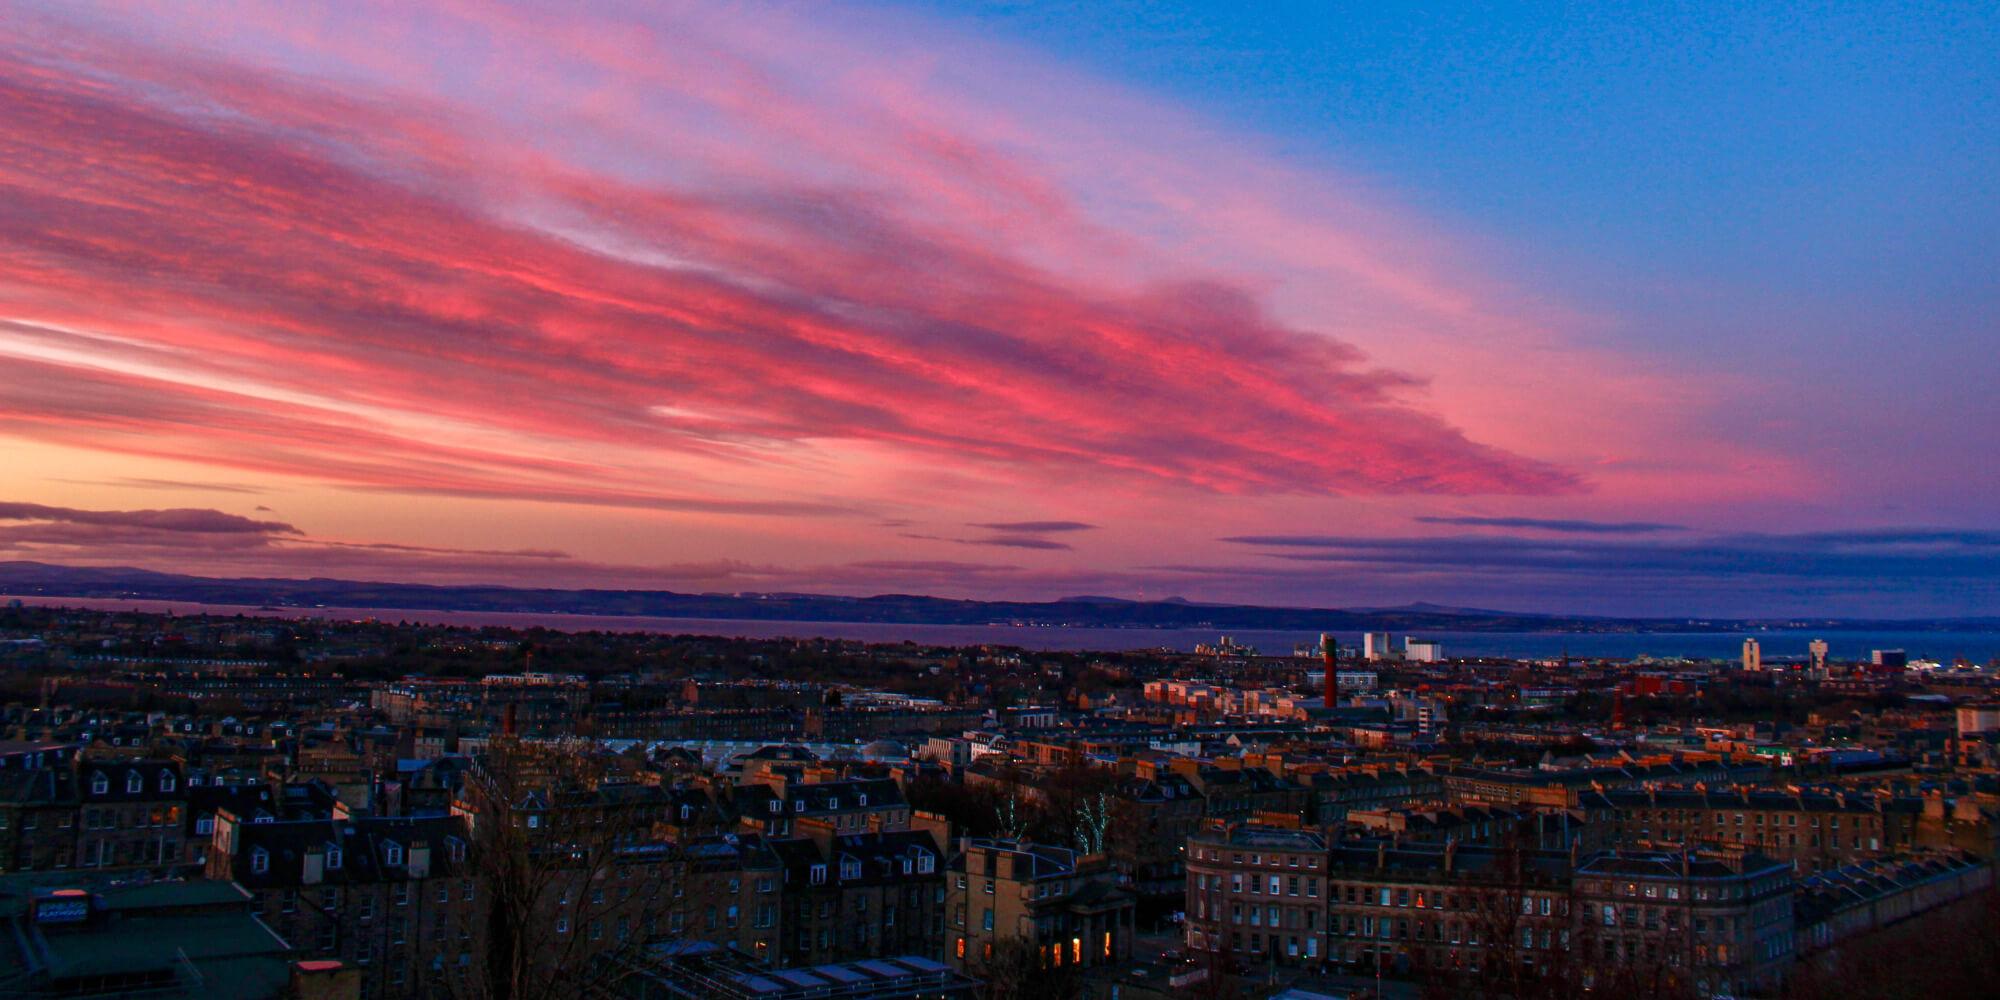 Edinburgh Leith Kamera Foto Stadtleben Schottland Stylerebelles reisen